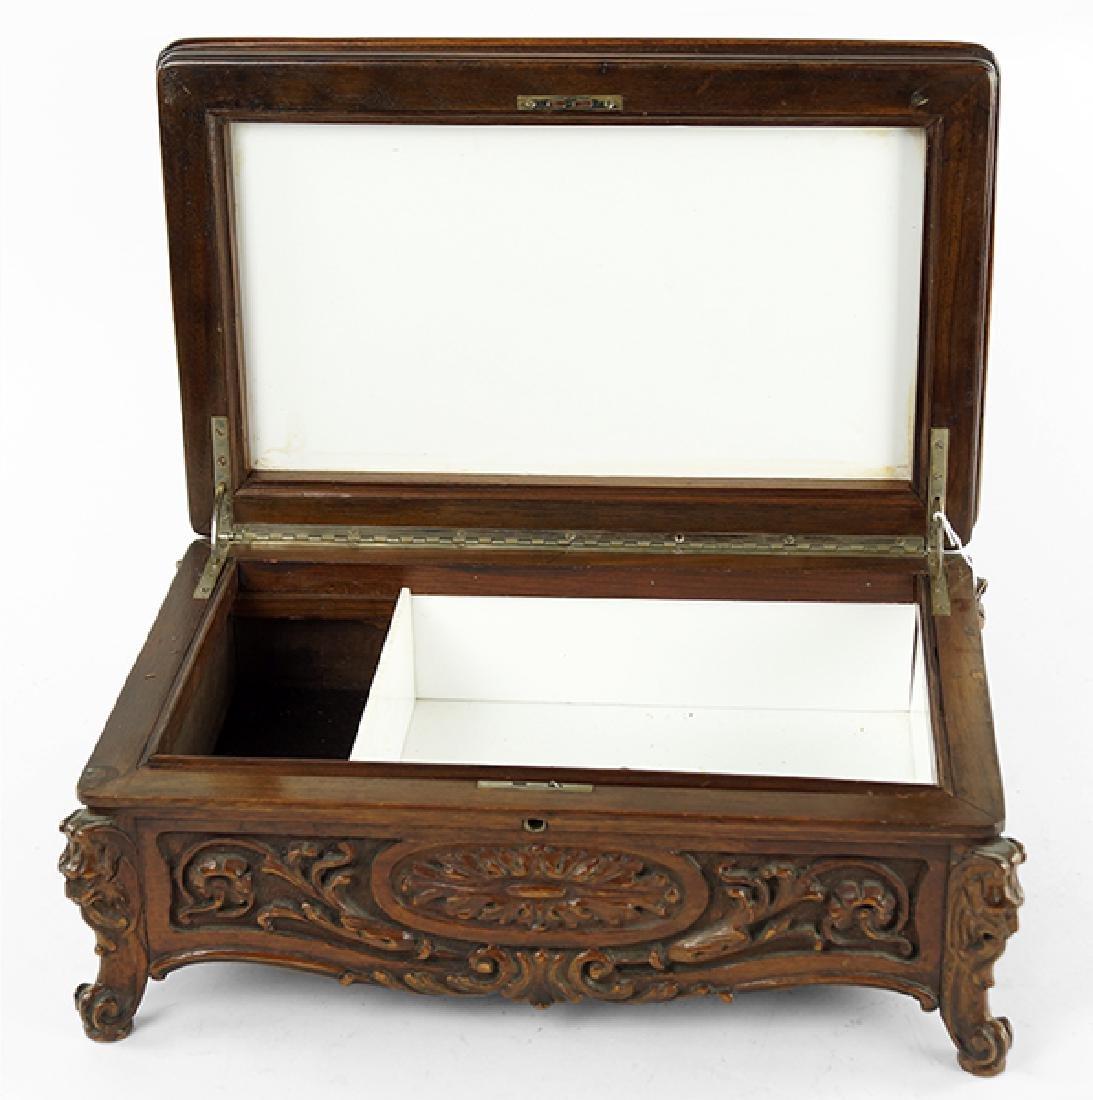 A Carved Wood Cigar Box. - 2